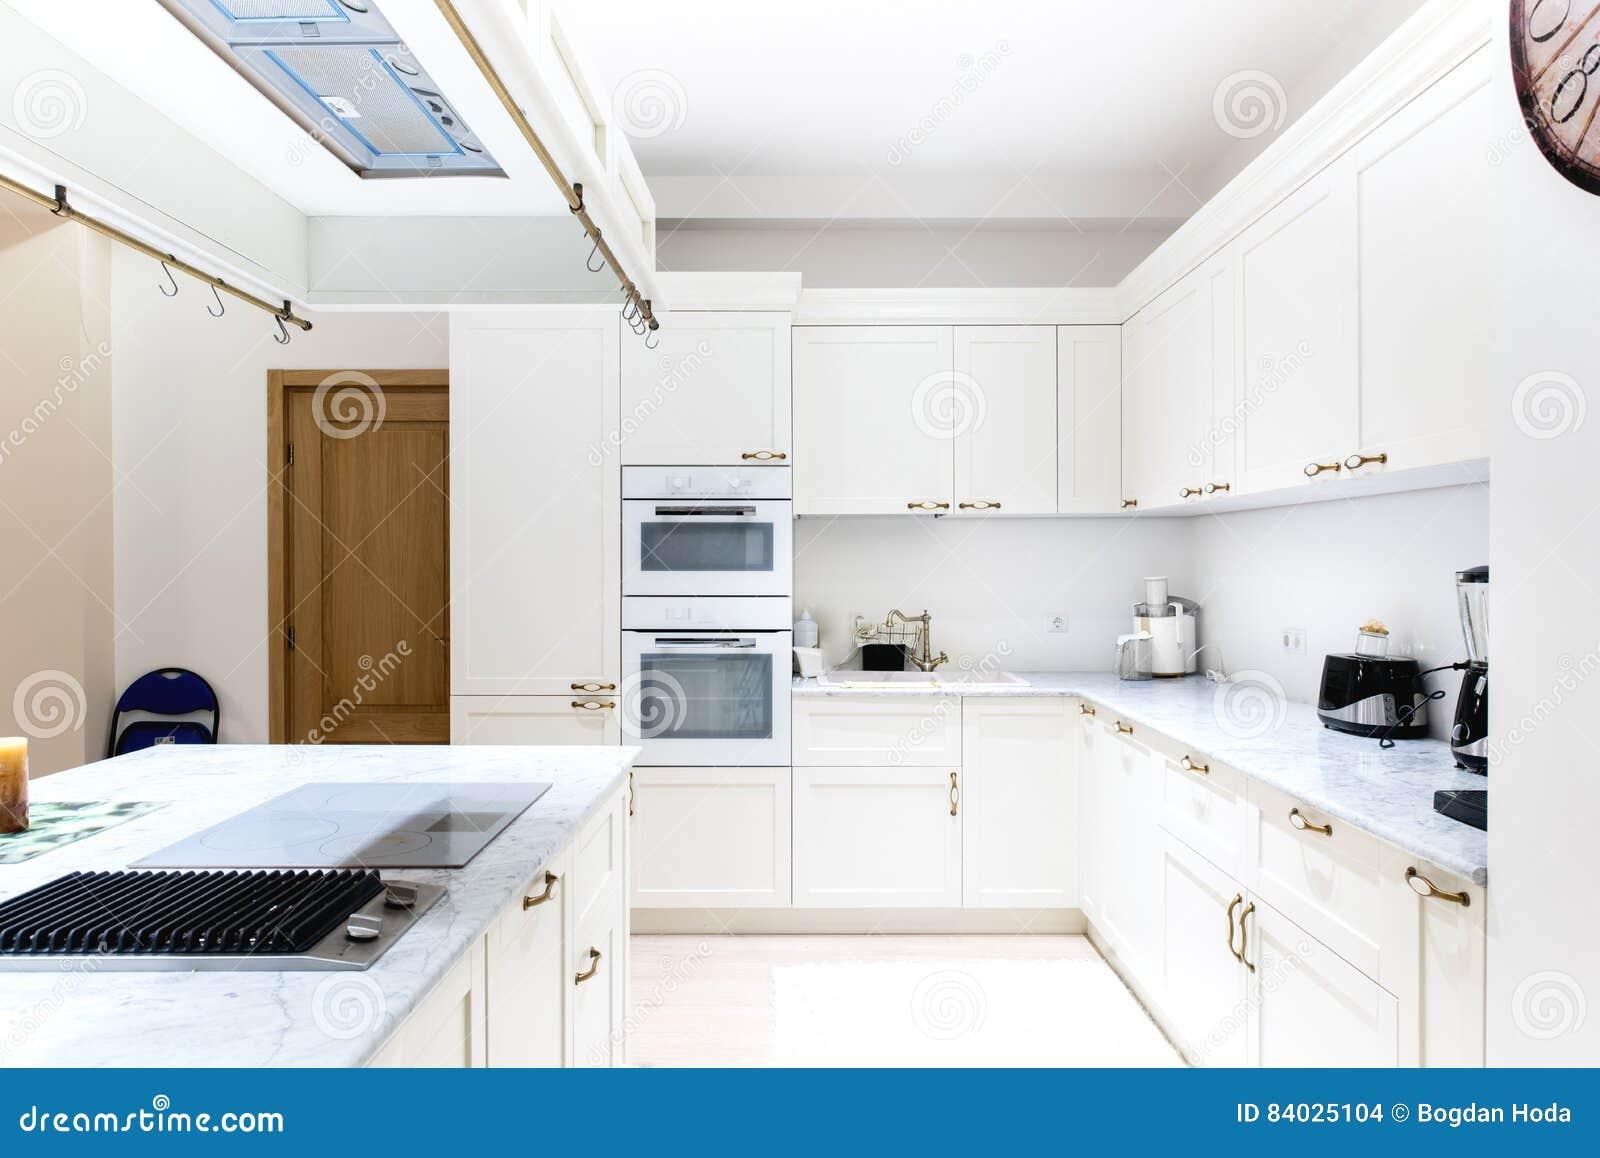 Cocina moderna lujosa gabinetes blancos de muebles de for Gabinetes de cocina blancos